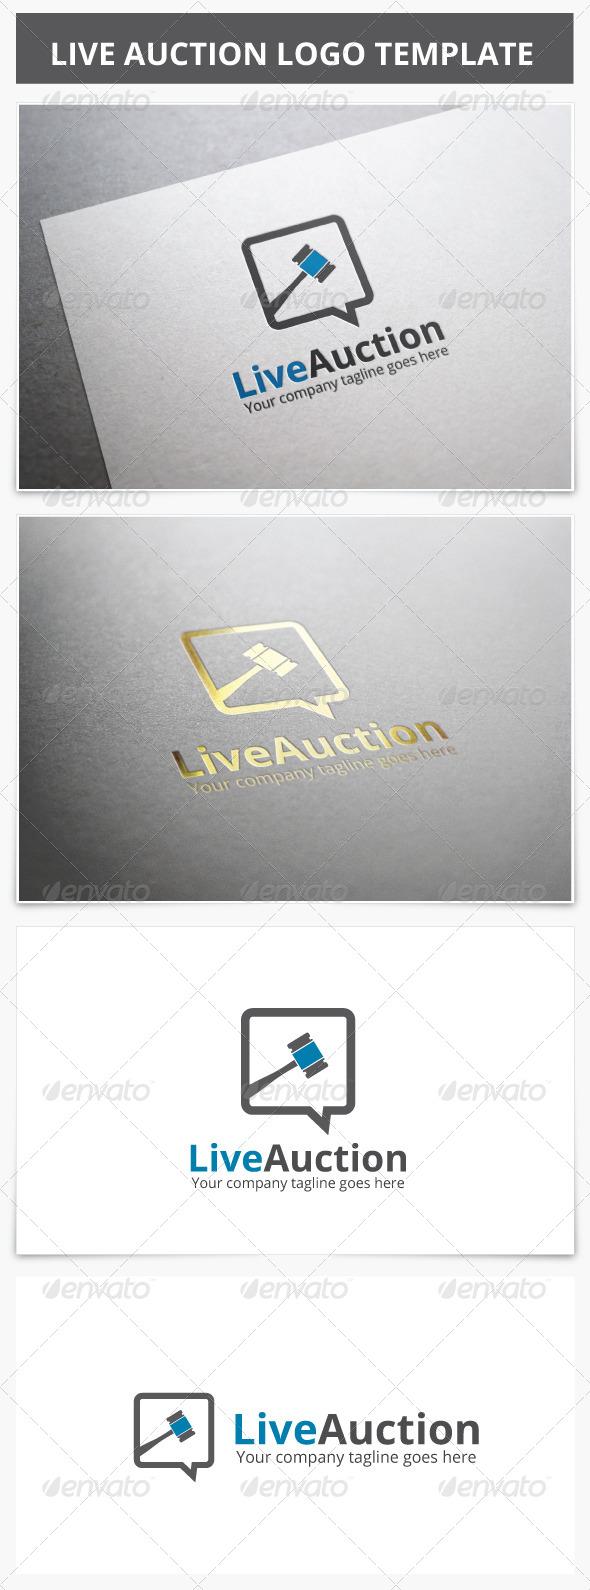 GraphicRiver Live Auction Logo 7174010